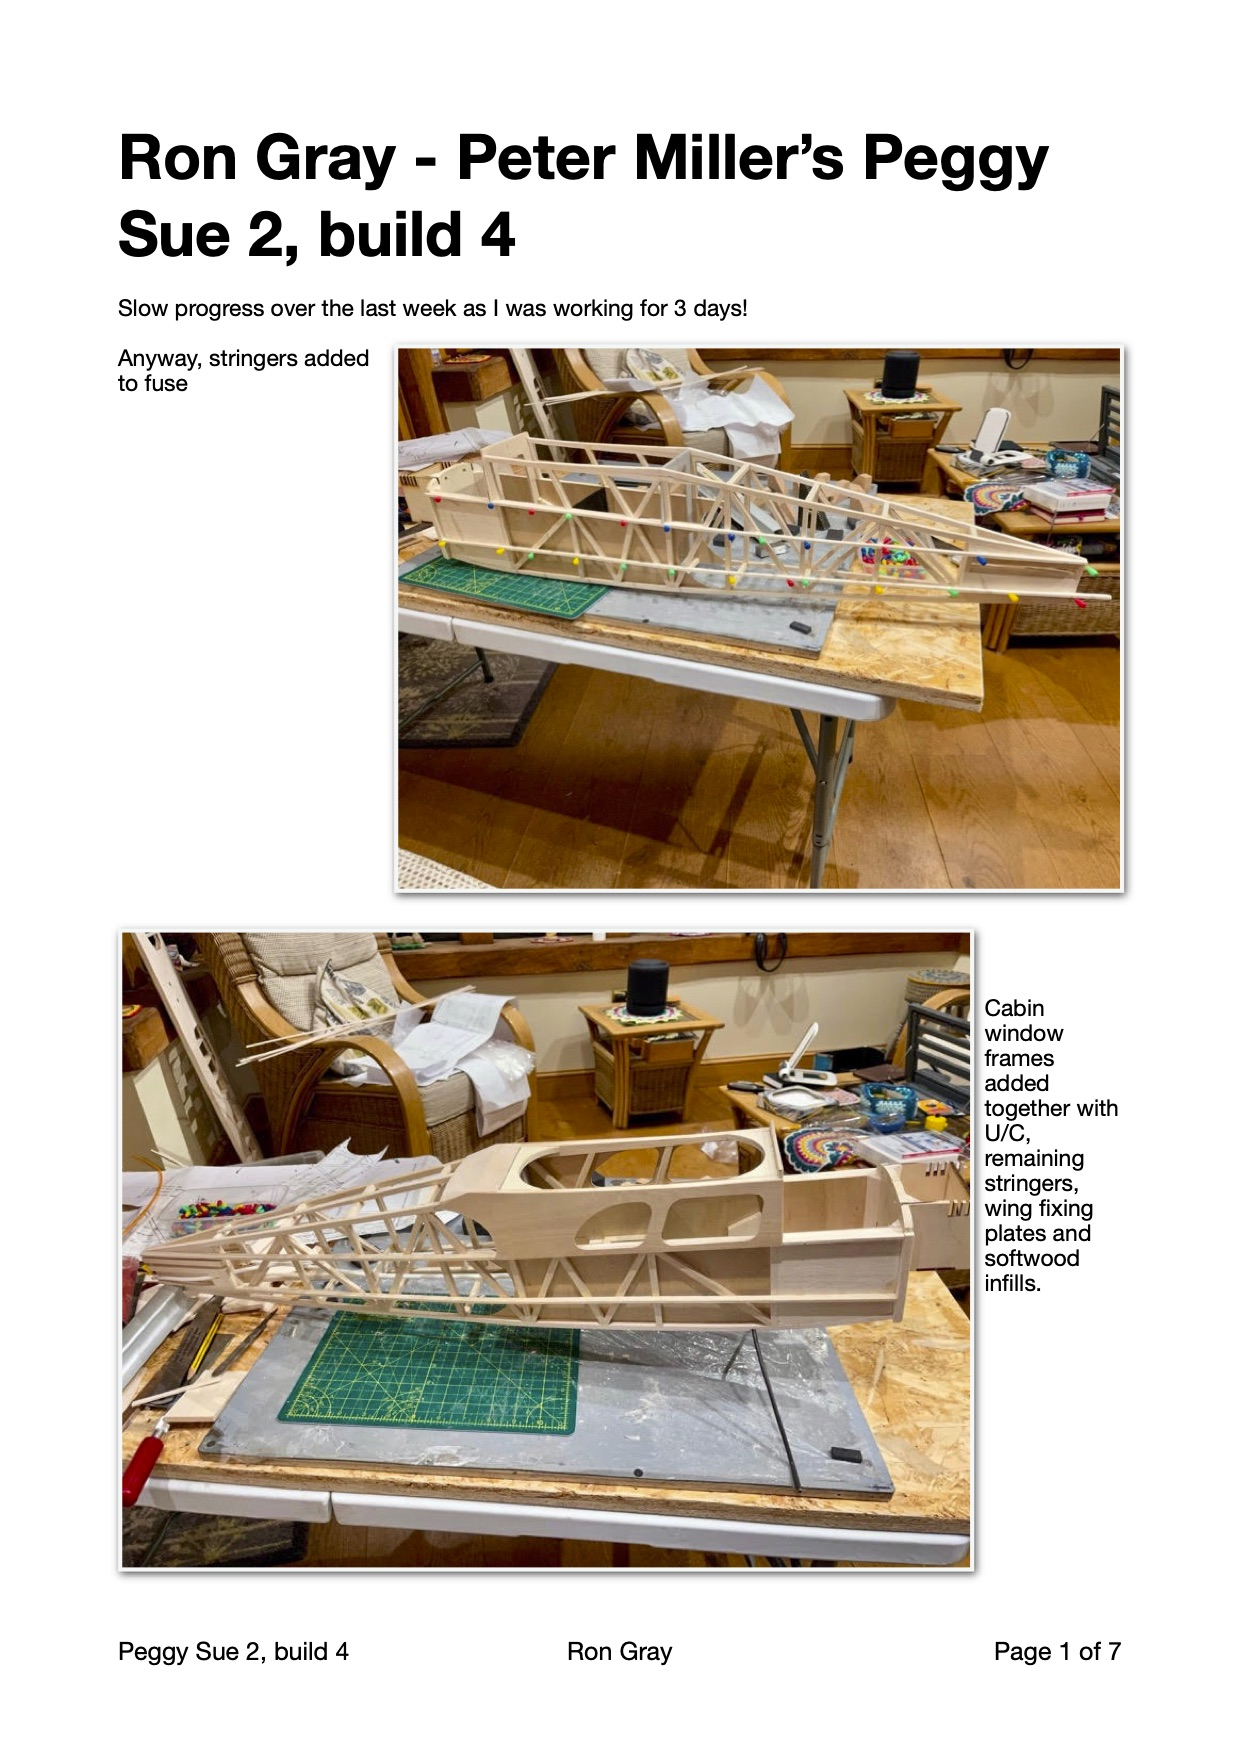 "Ron Gray - Peter Miller's Peggy Sue2, build report 4"" width="